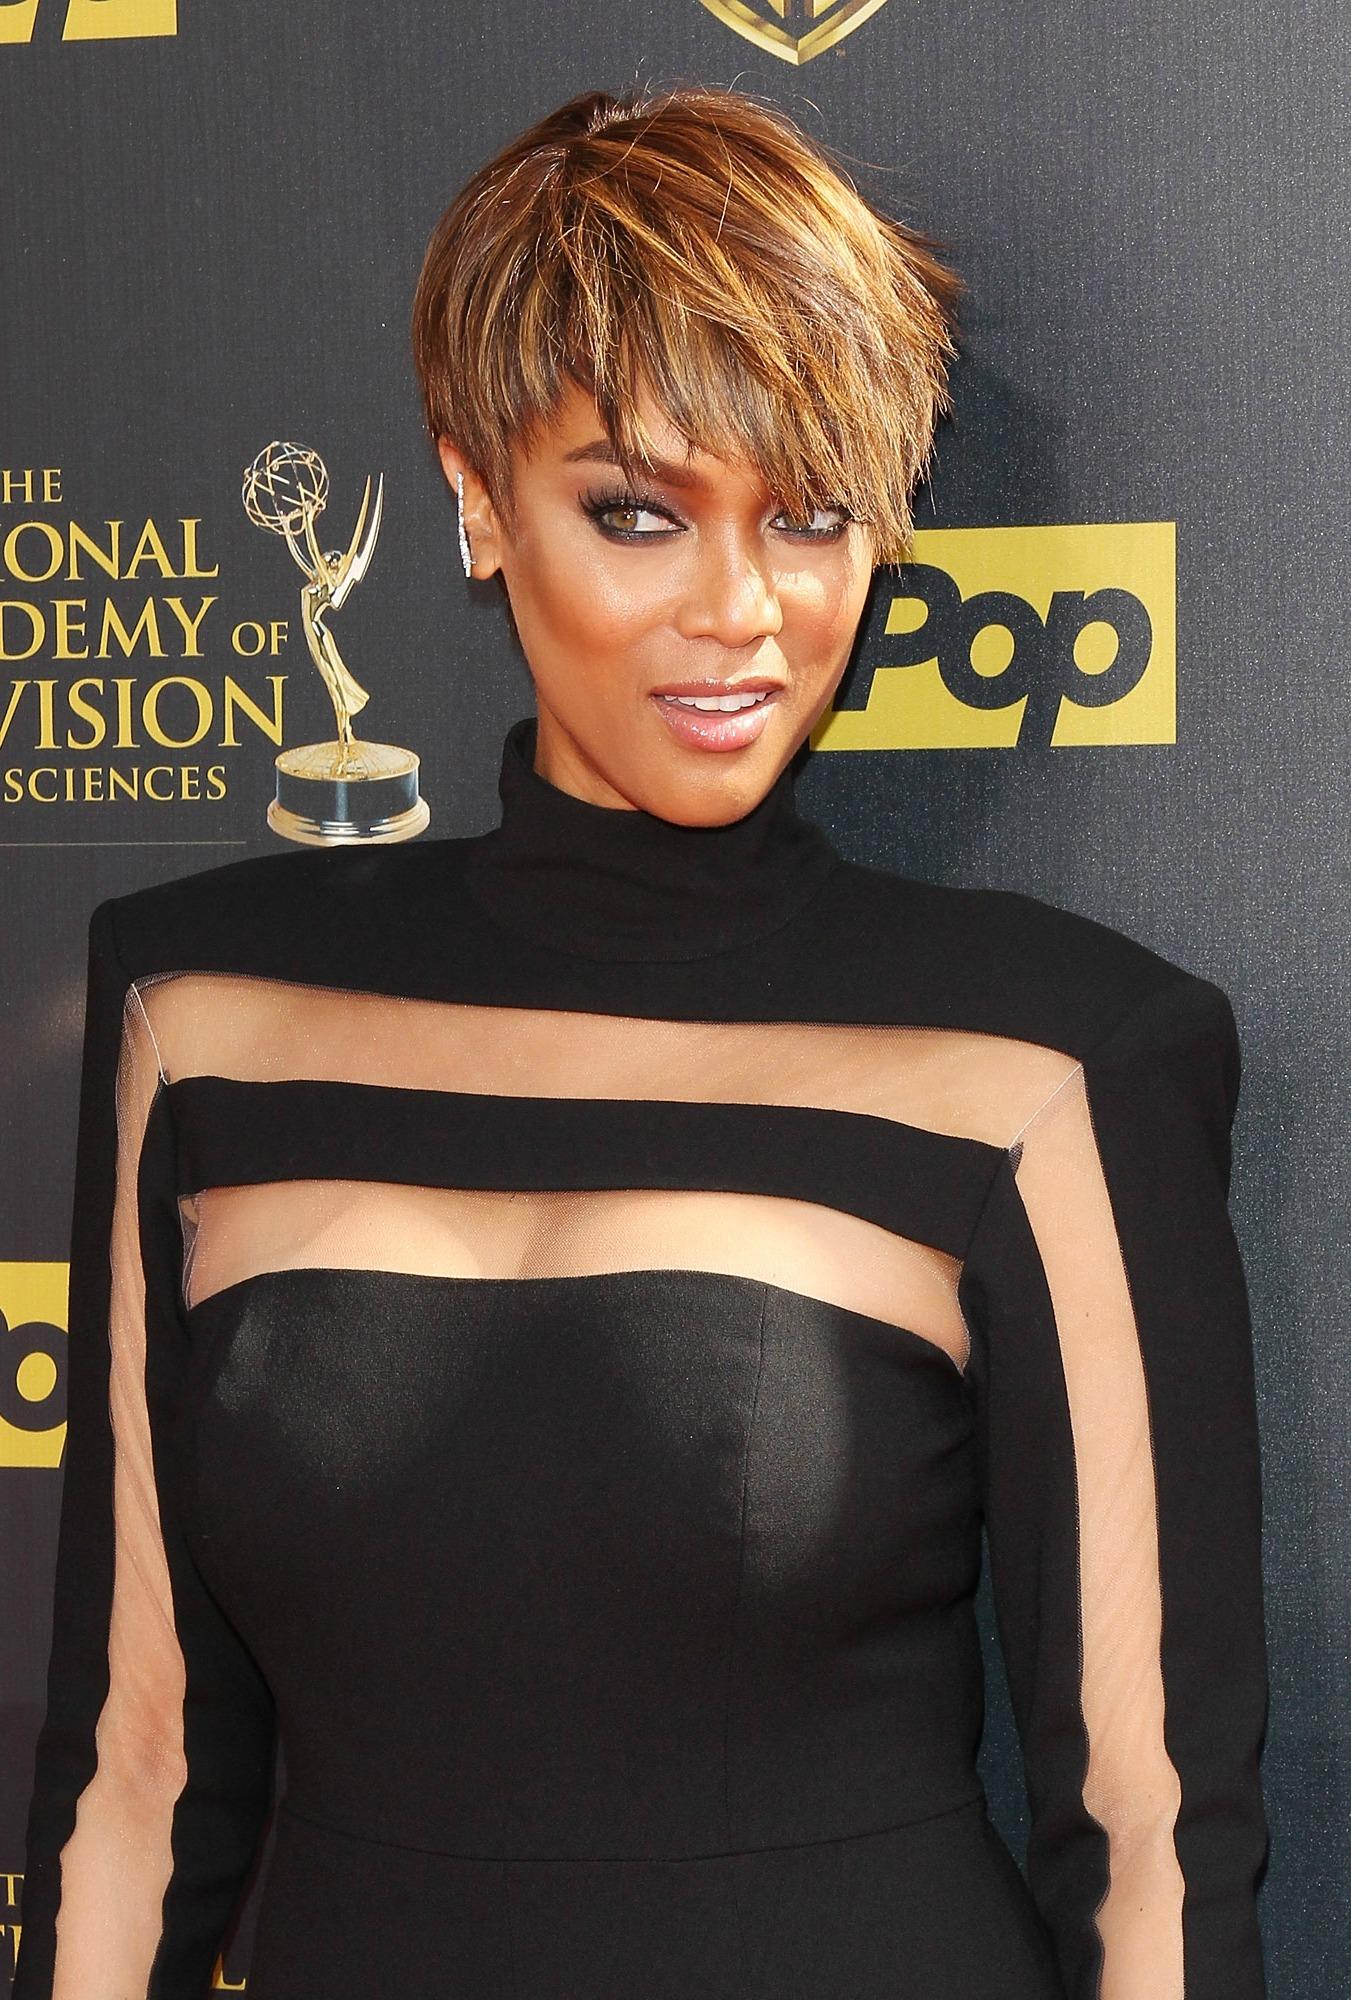 Astonishing 45 Black Hairstyles For Short Hair Short Haircuts For Black Women Short Hairstyles Gunalazisus